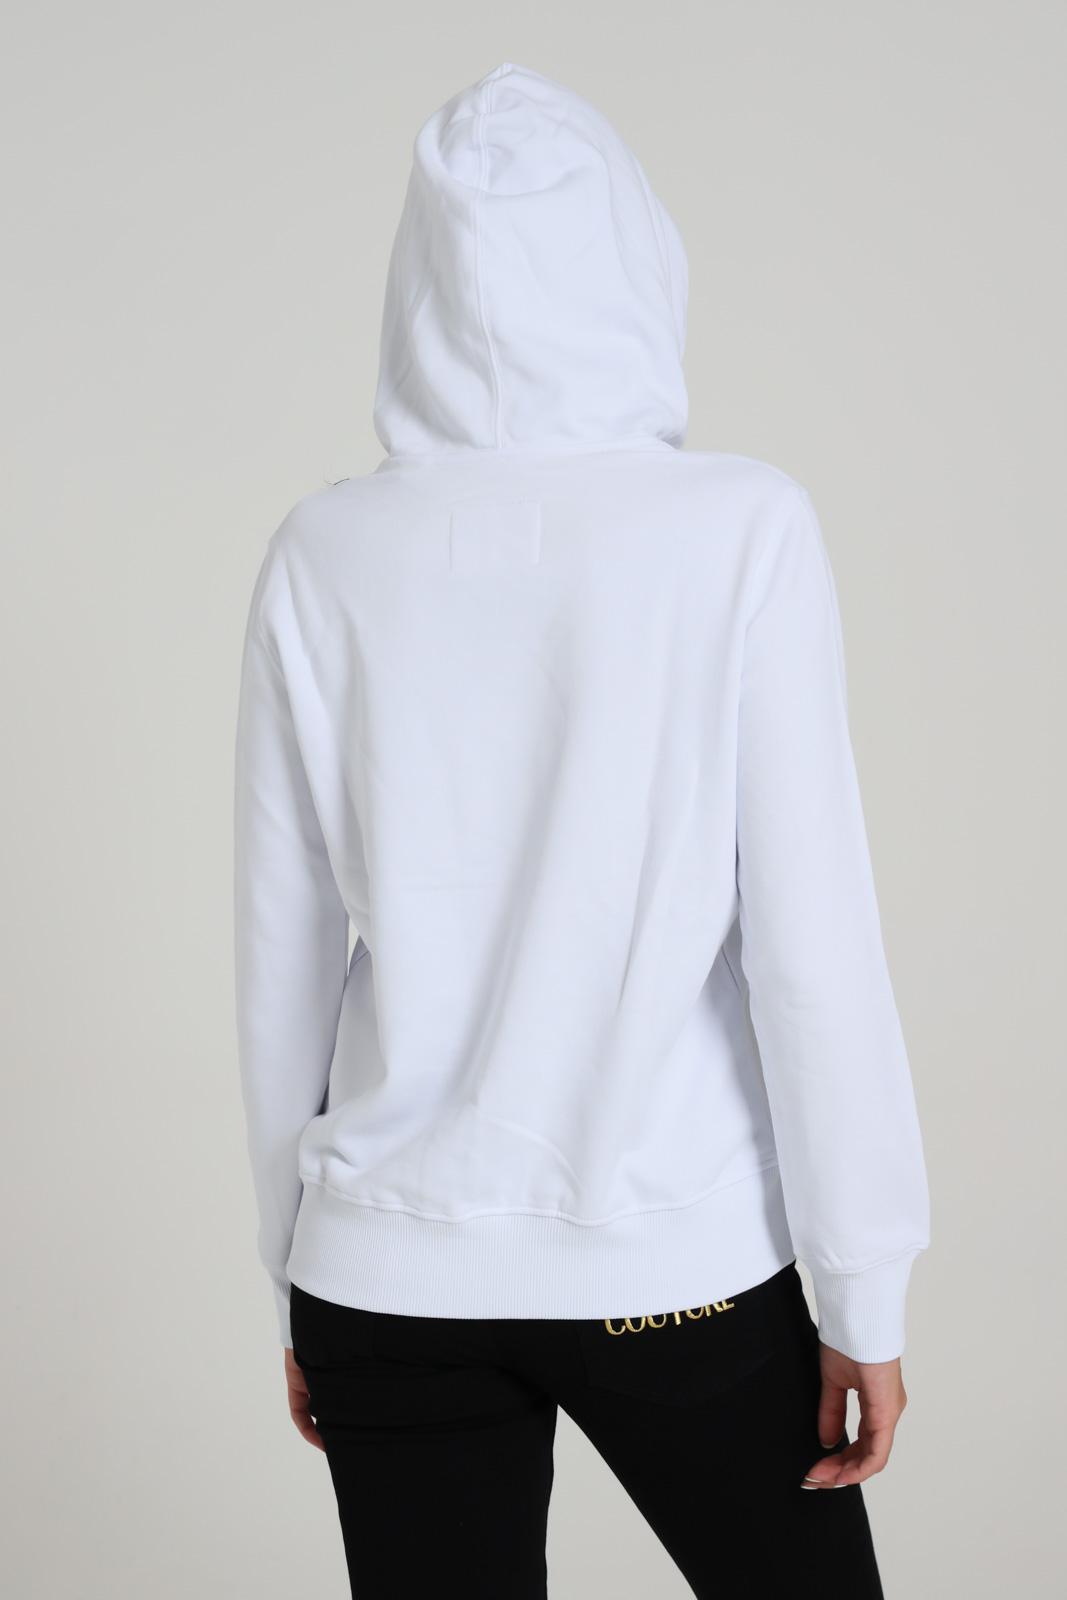 VERSACE JEANS COUTURE | Sweatshirt | B6HZA7TS30318003